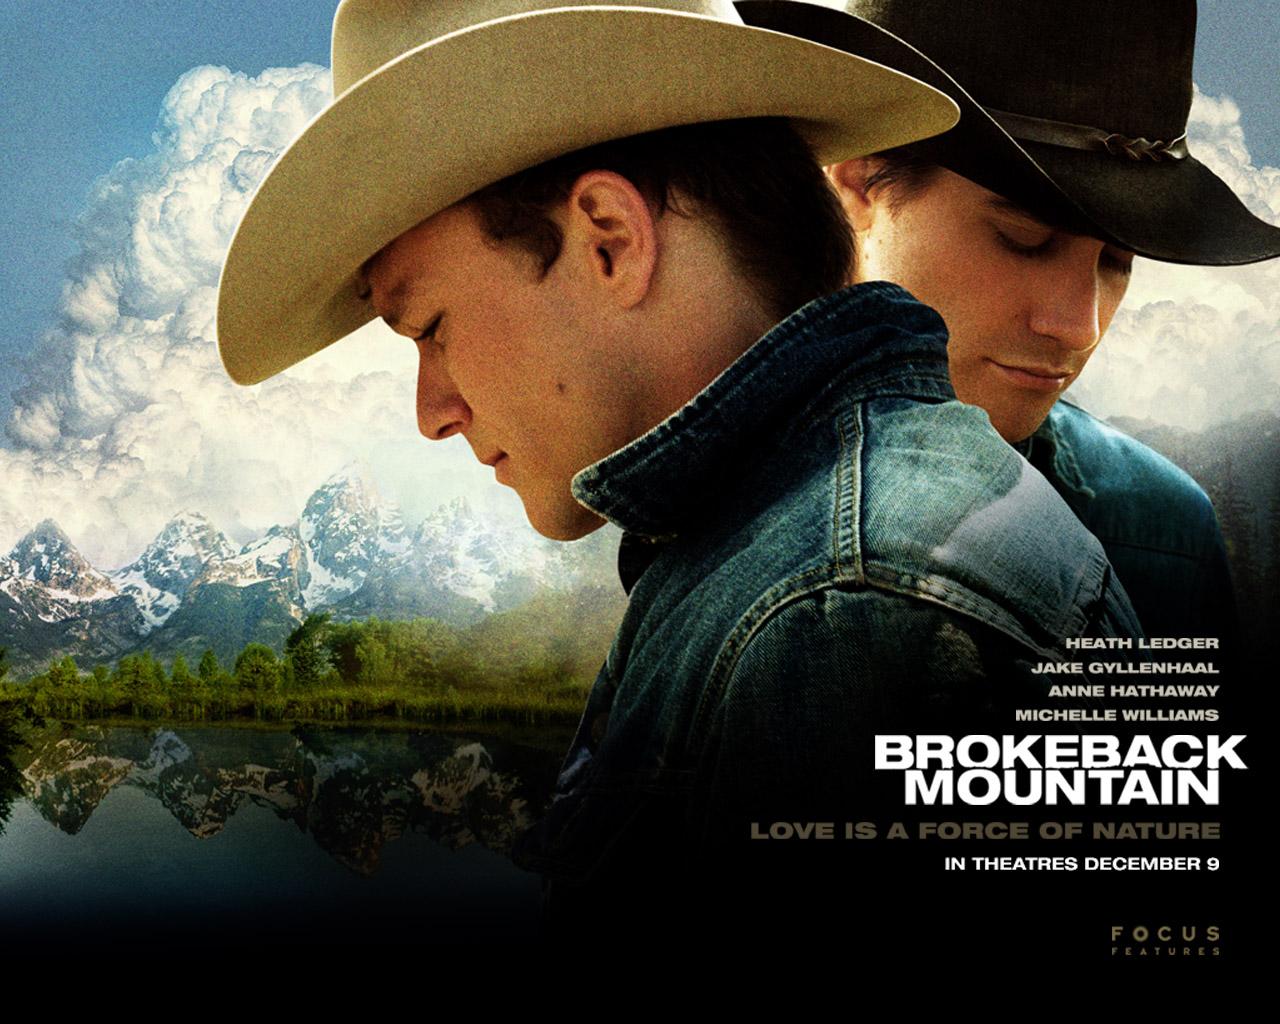 http://4.bp.blogspot.com/_dcAWzoBkJp0/TQ_F4Bj_9cI/AAAAAAAADOA/HdgcU1mPlbA/s1600/Heath_Ledger_in_Brokeback_Mountain_Wallpaper_1_1280.jpg